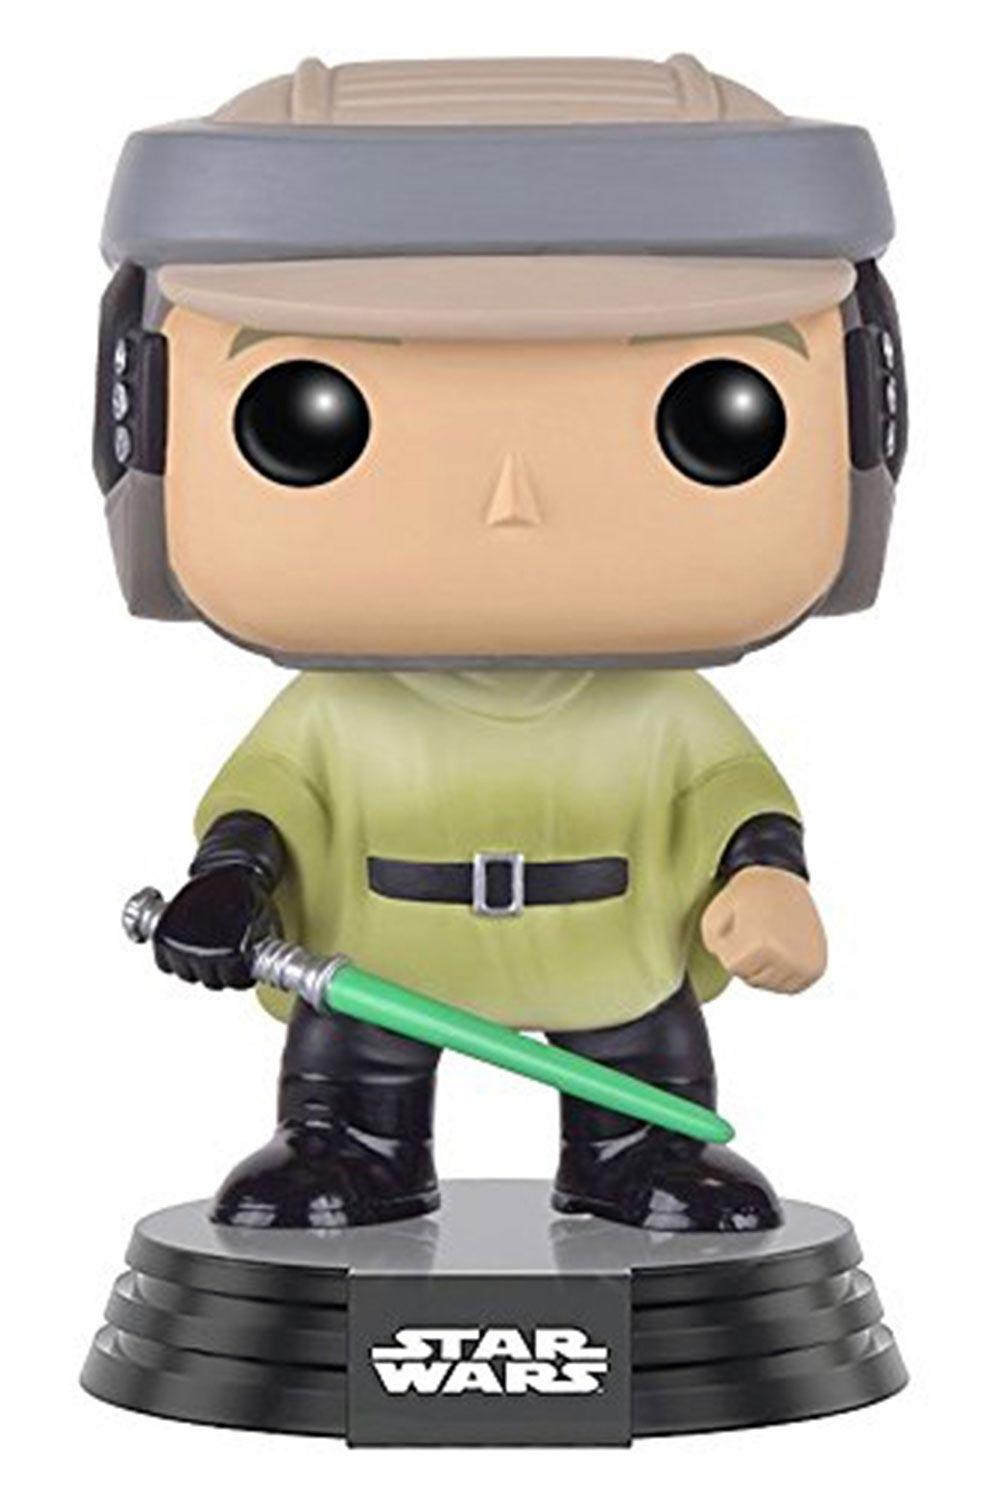 Pop Star Wars Endor Luke Skywater Vinyl Figure